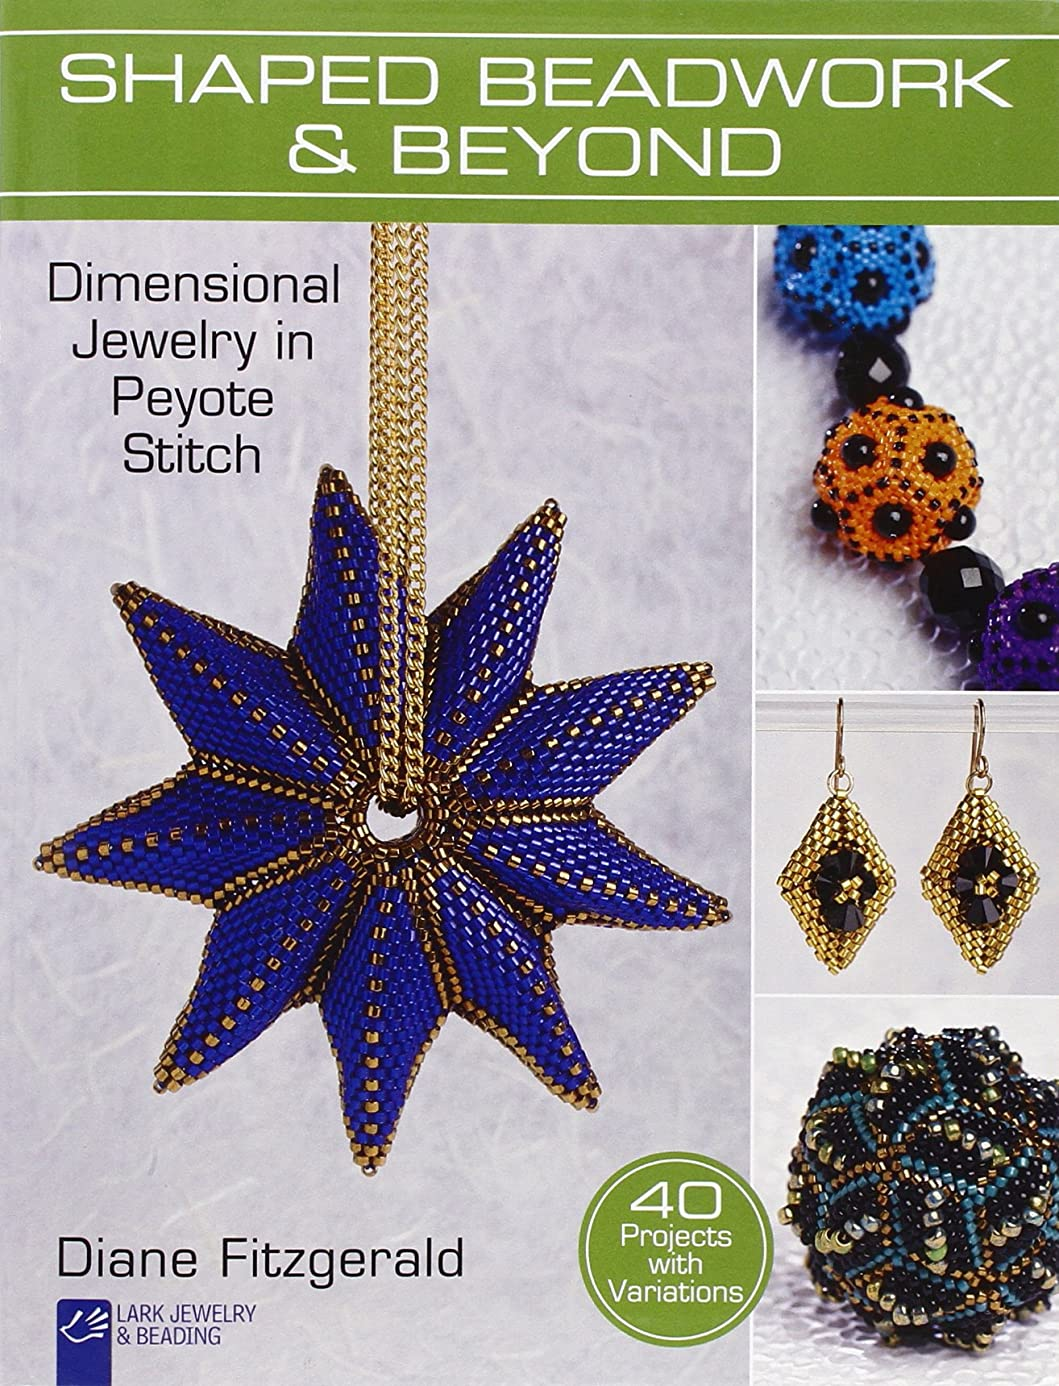 Shaped Beadwork & Beyond: Dimensional Jewelry in Peyote Stitch (Lark Jewelry & Beading Bead Inspirations) nok4935052